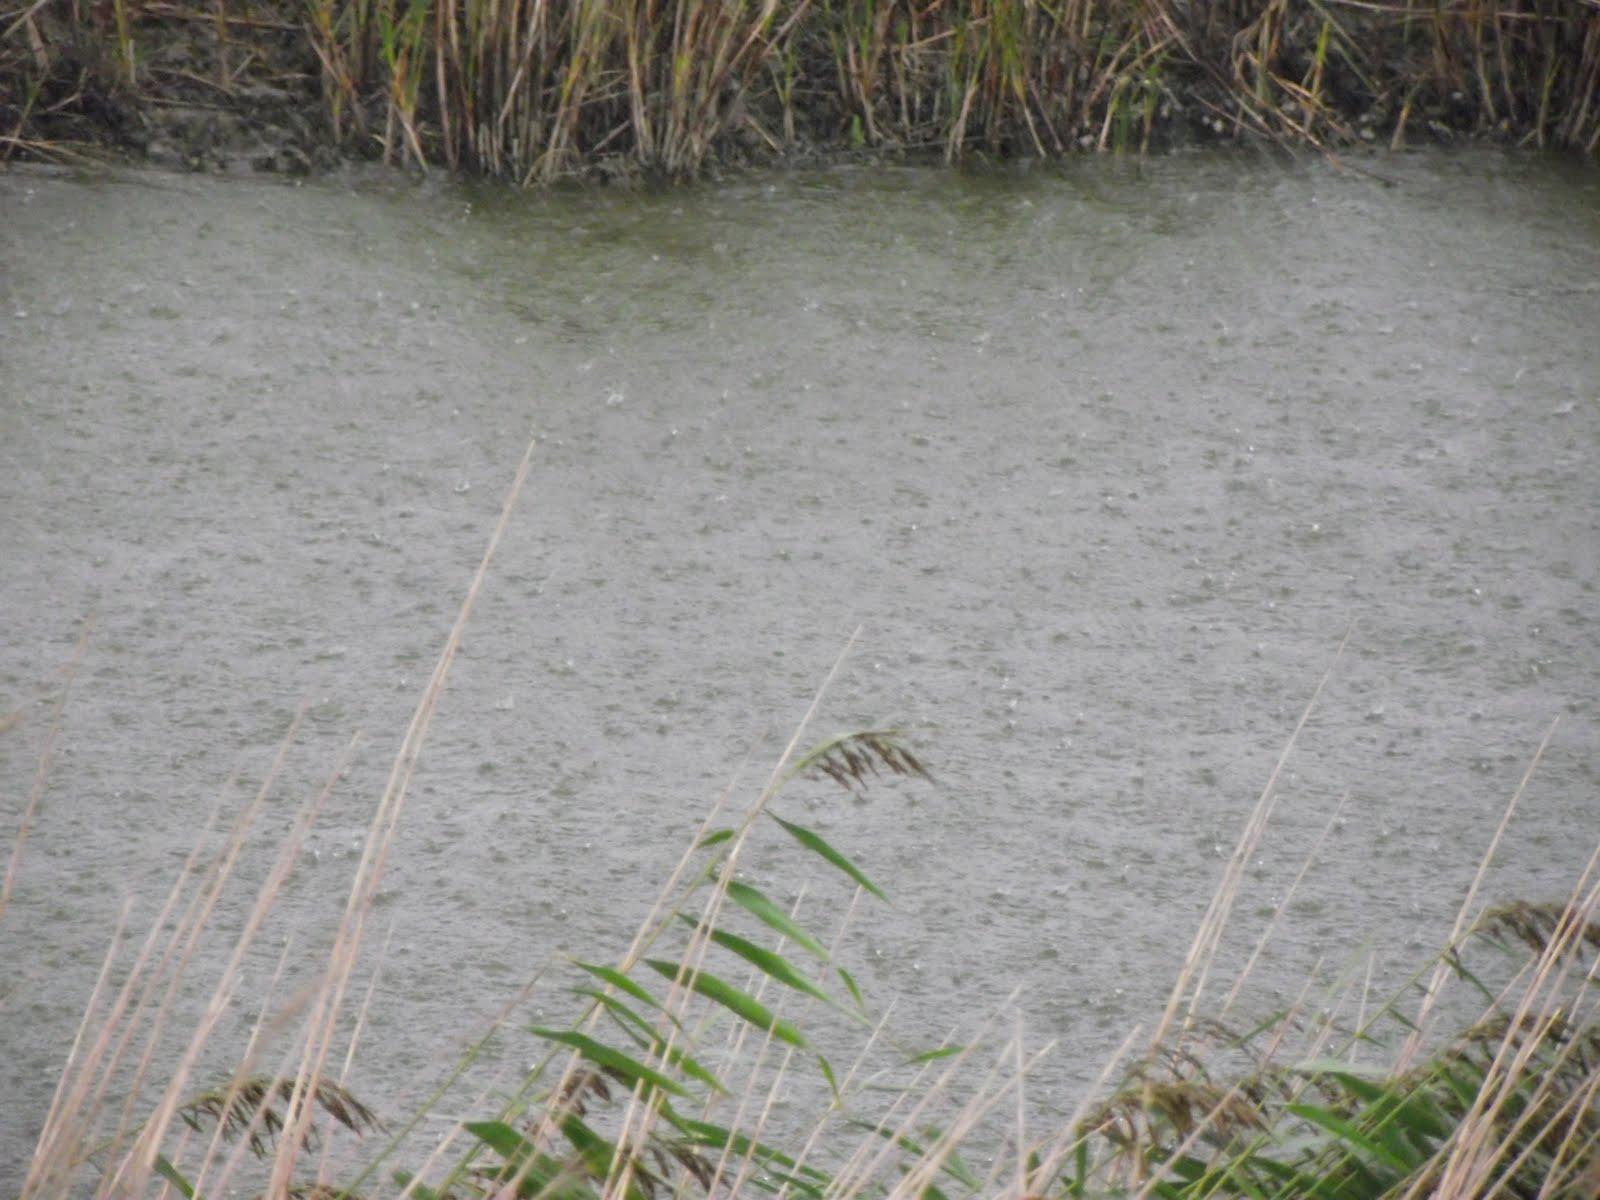 how to turn down rain pubg